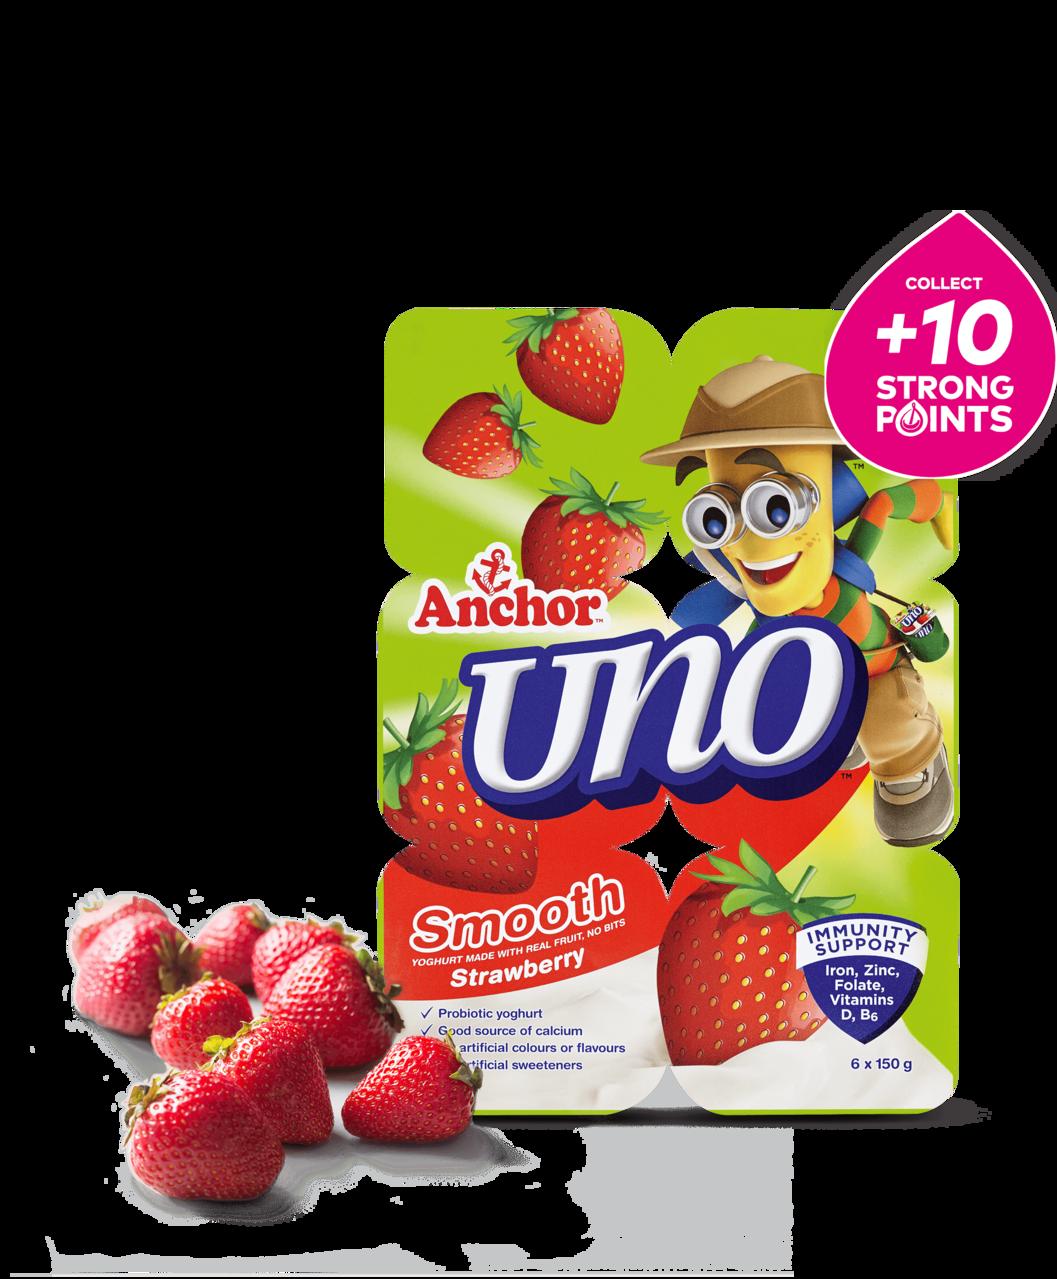 Anchor Uno Strawberry Yoghurt 6 x 150g pack